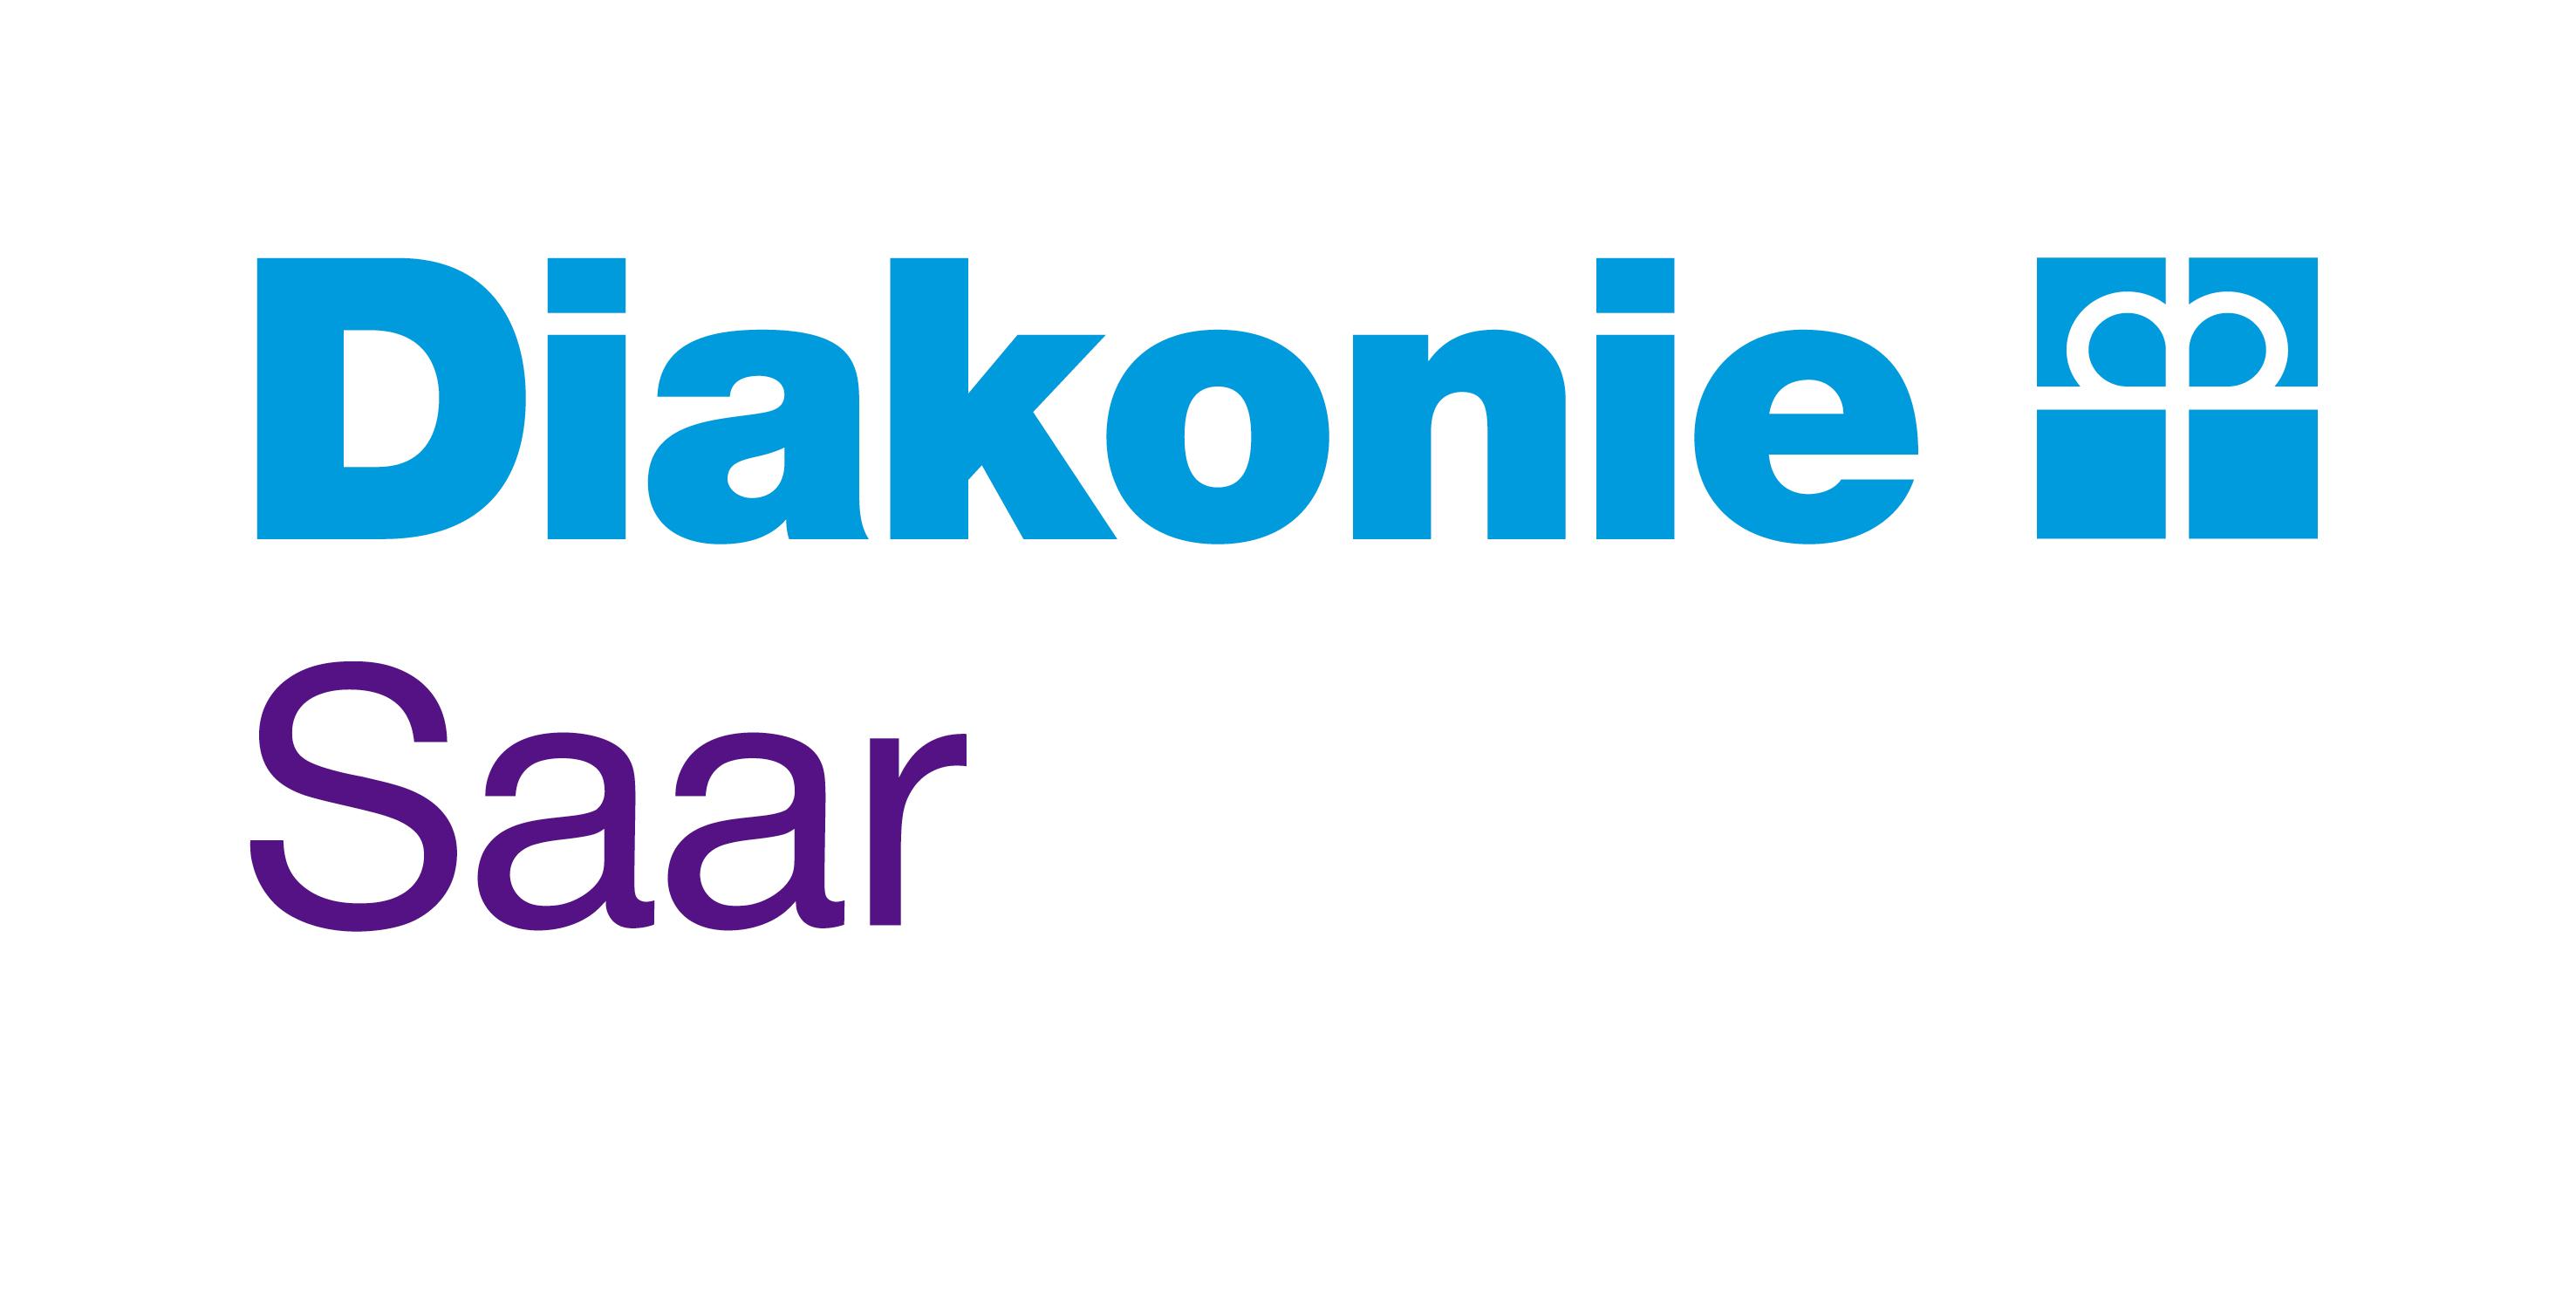 Logo: Diakonisches Werk an der Saar gGmbH